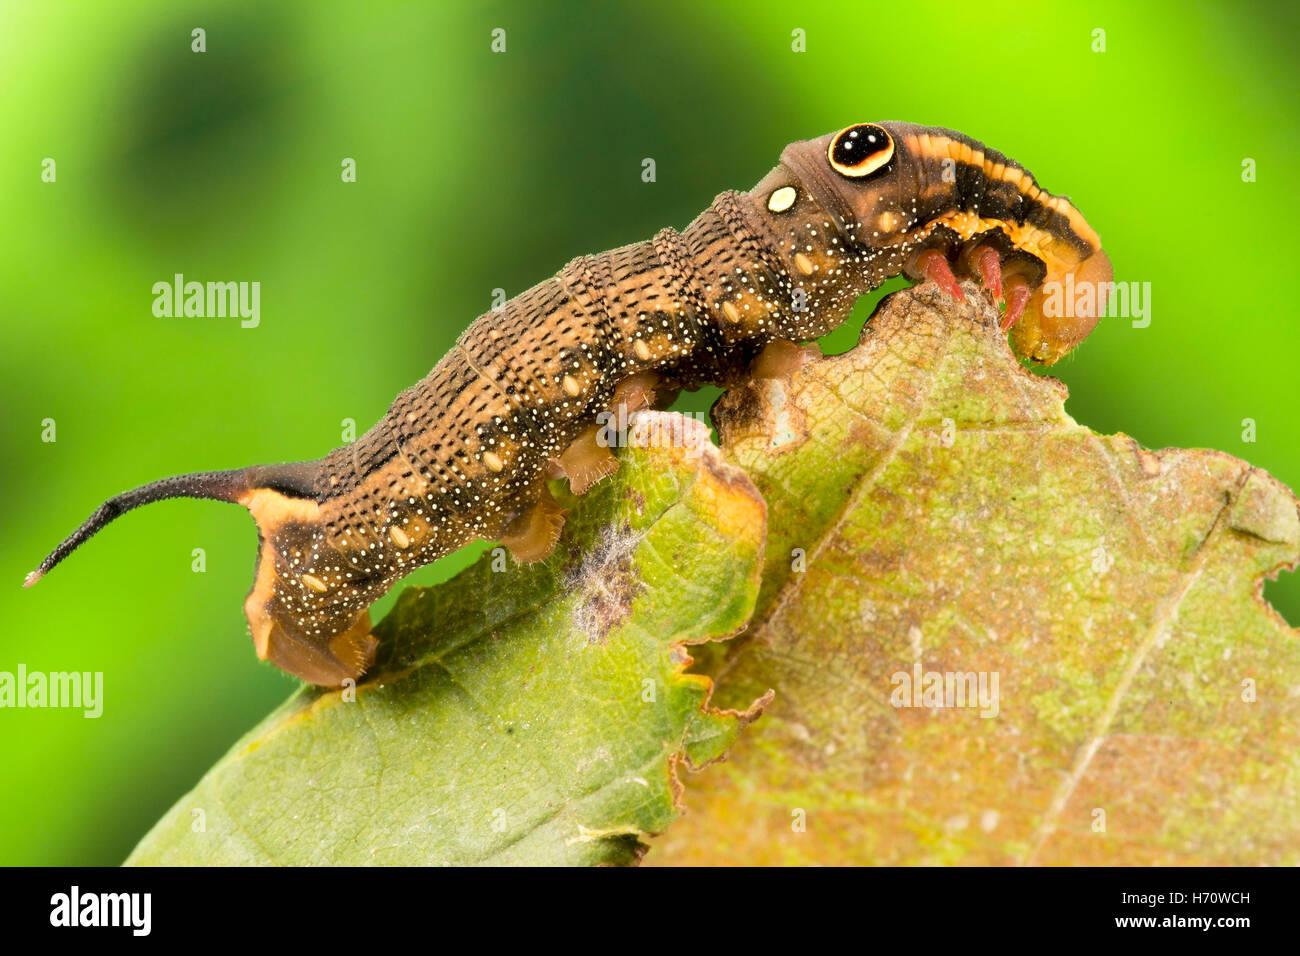 Vine Hawk Moth's False eye caterpillar (Hippotion rosetta) - Stock Image